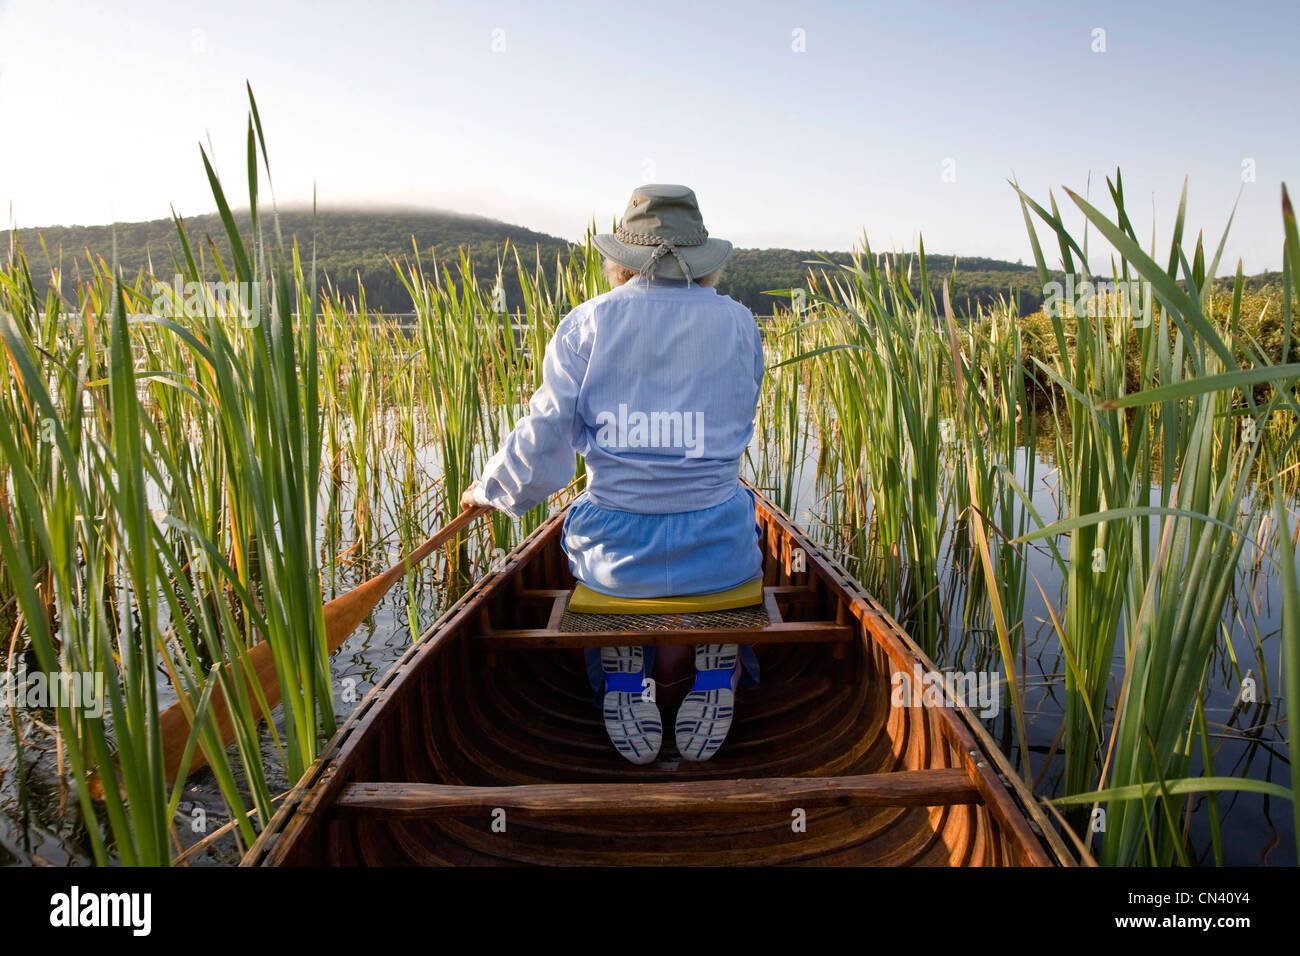 Woman paddling canoe through reeds, Smoke Lake, Algonquin Park, Ontario - Stock Image